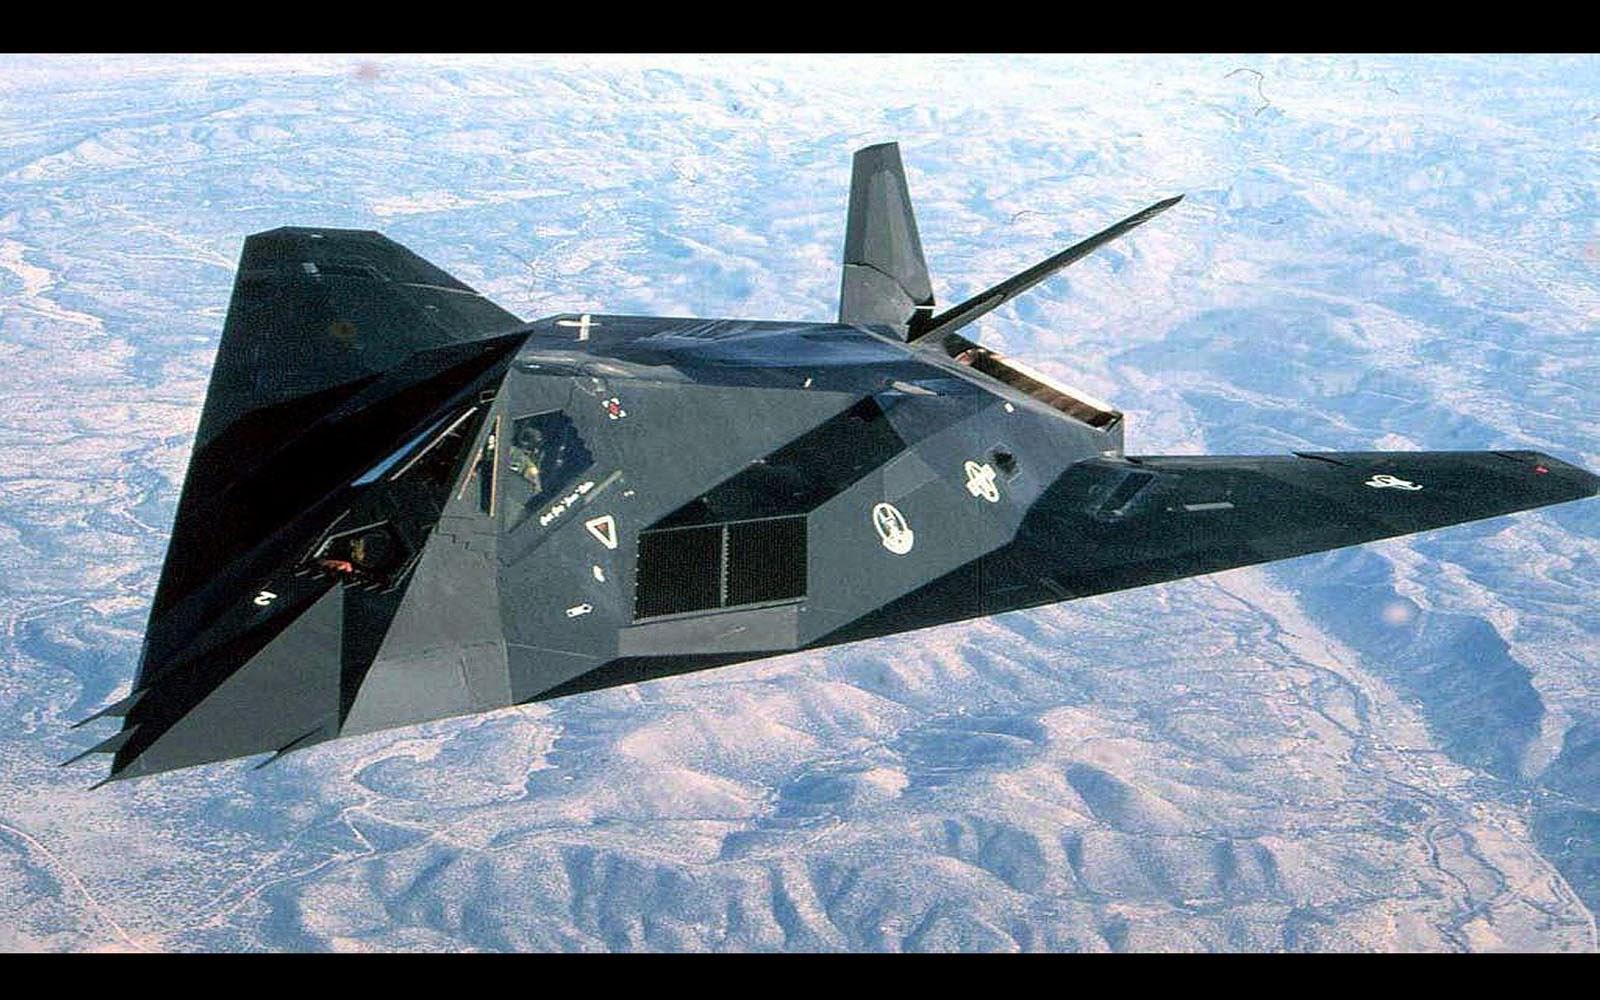 F 117 Nighthawk At Night F17 Nighthawk R...